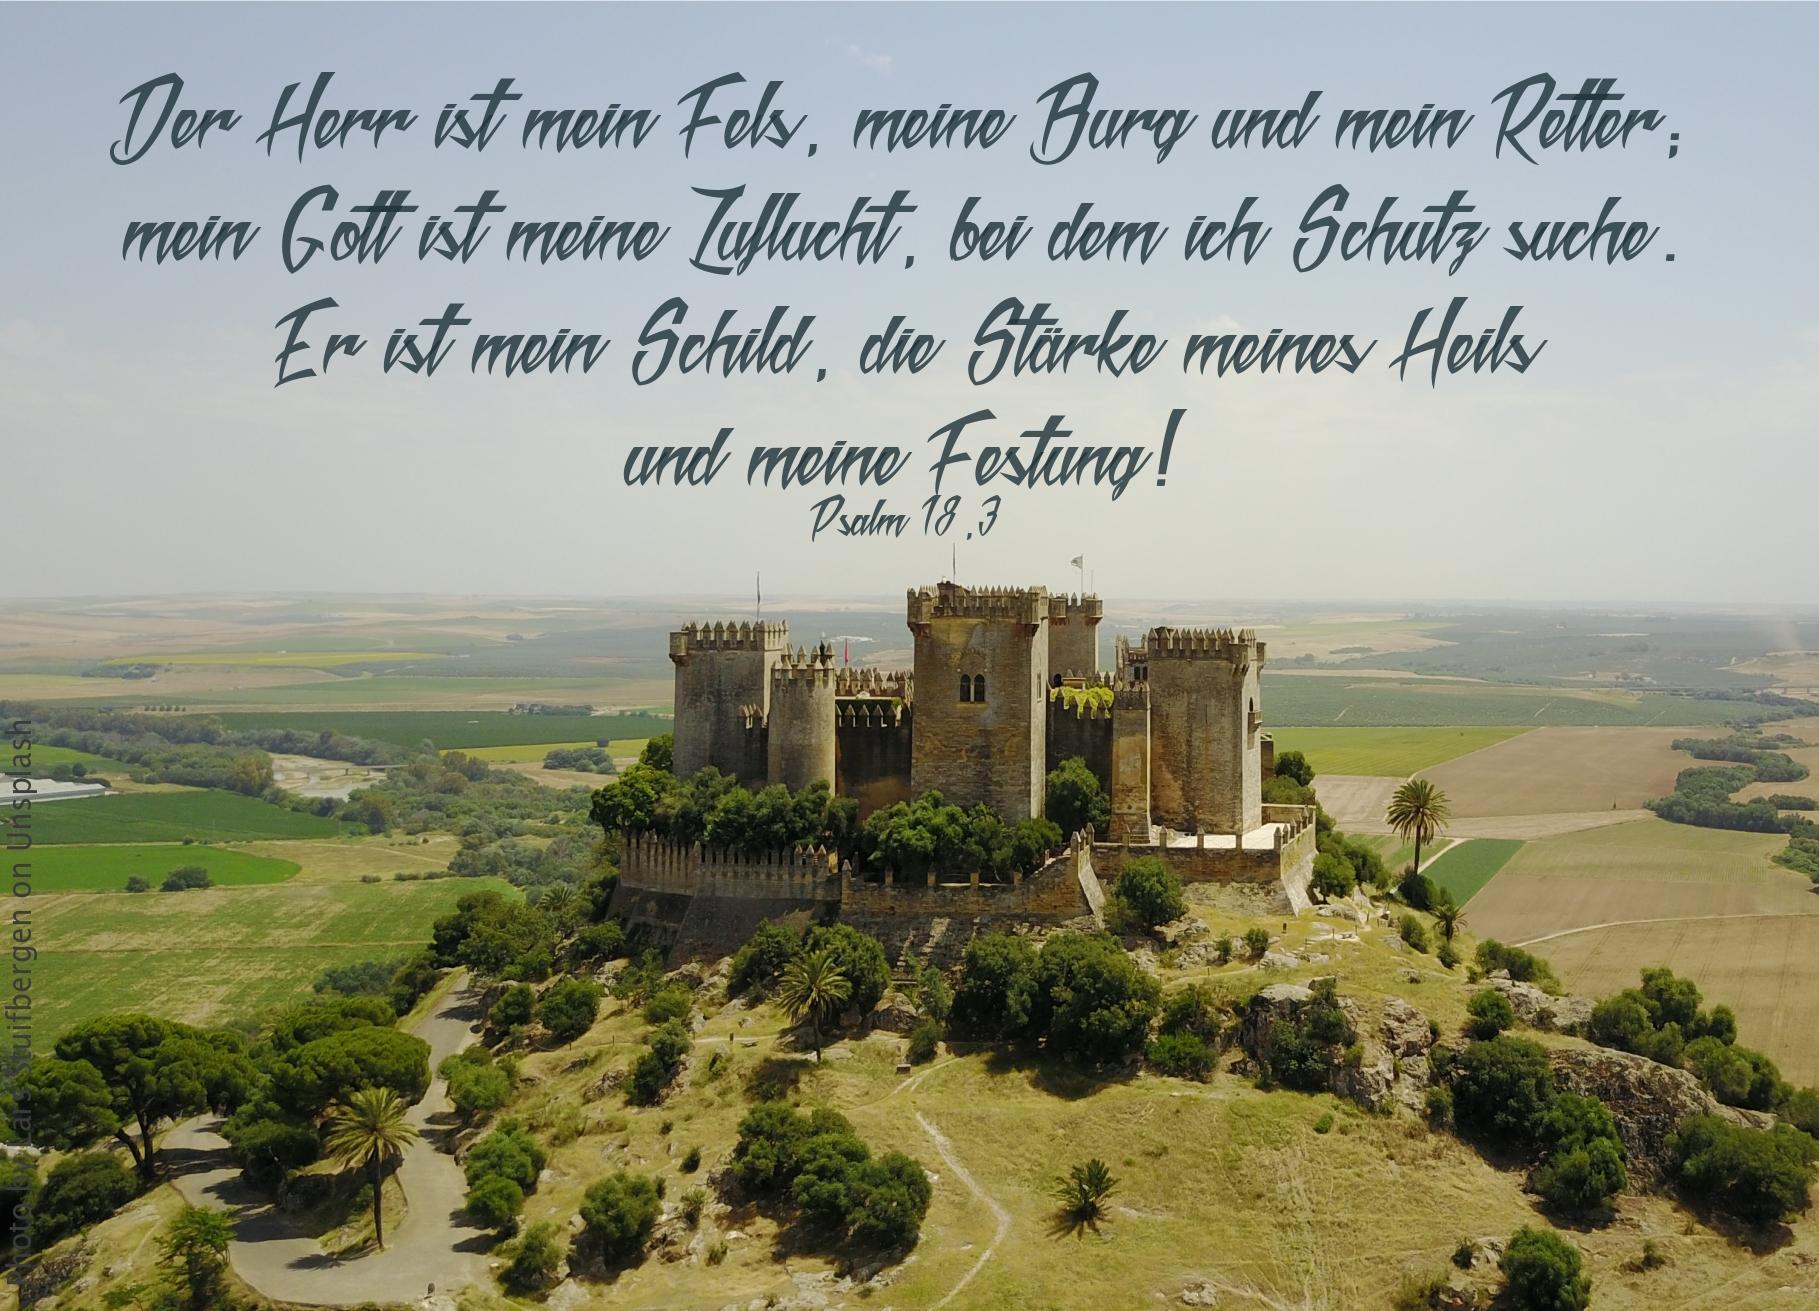 "alt=""Burg_auf_Berg_vor_Ebene_erwartet_bibelhoerbuch_Tempelweihe"""